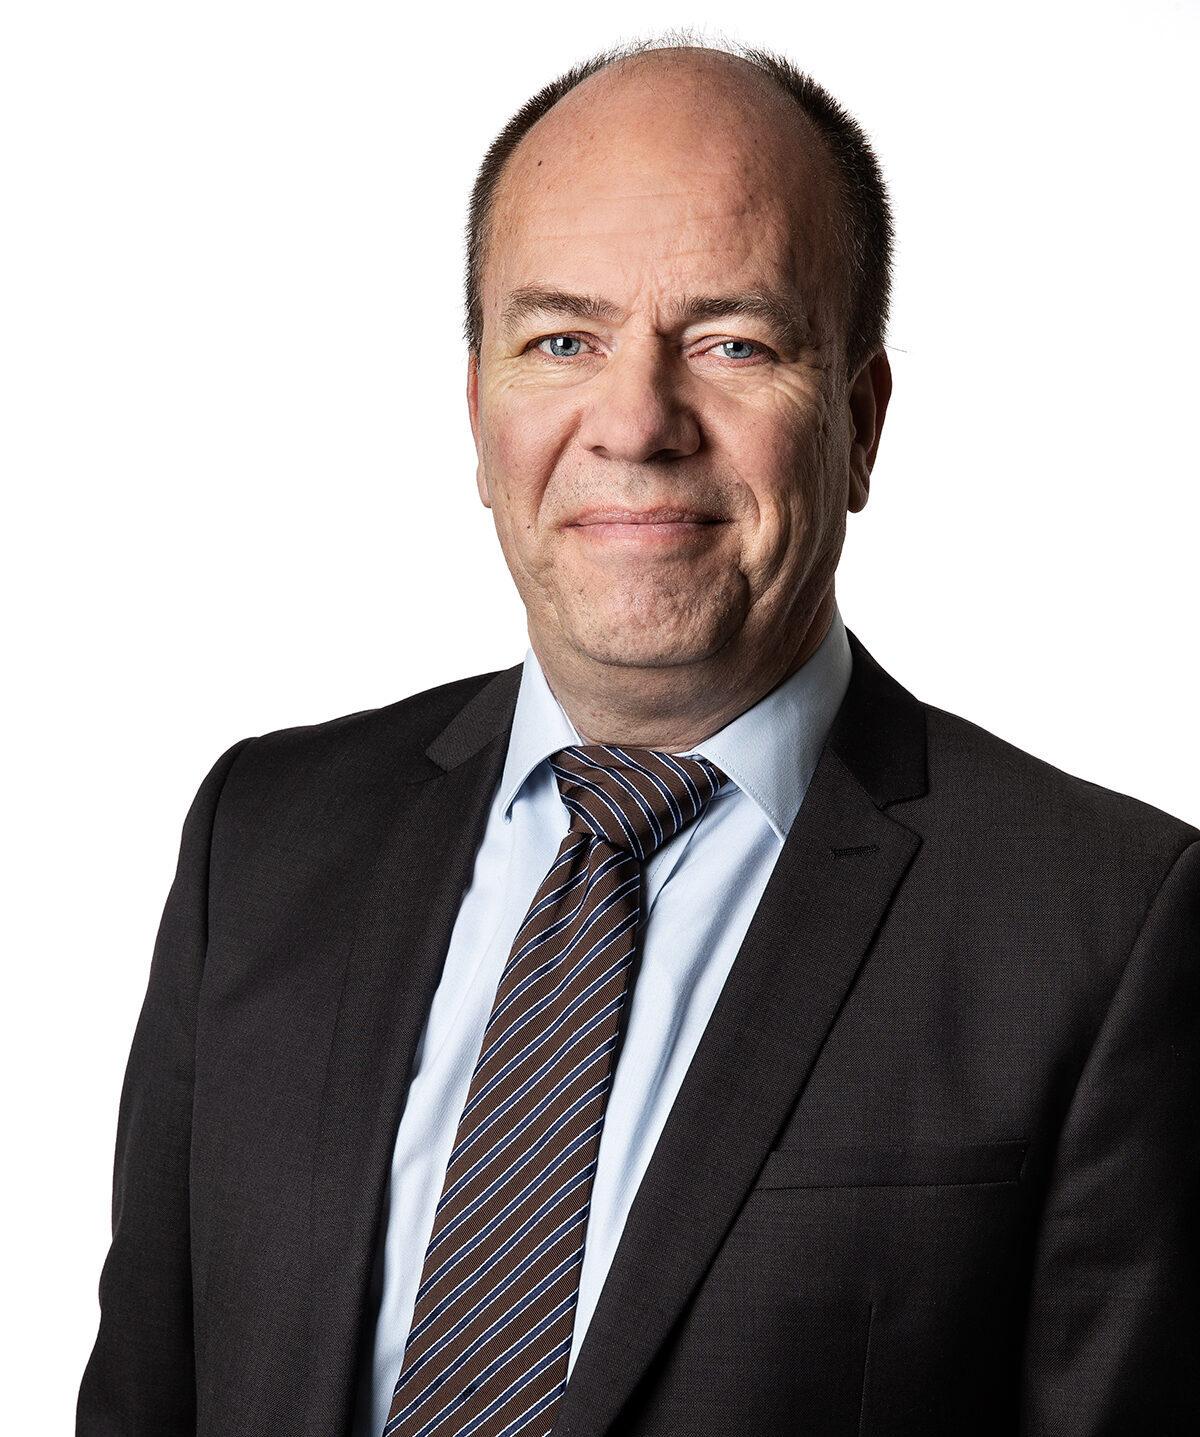 Kst. divisionschef Lasse Toft